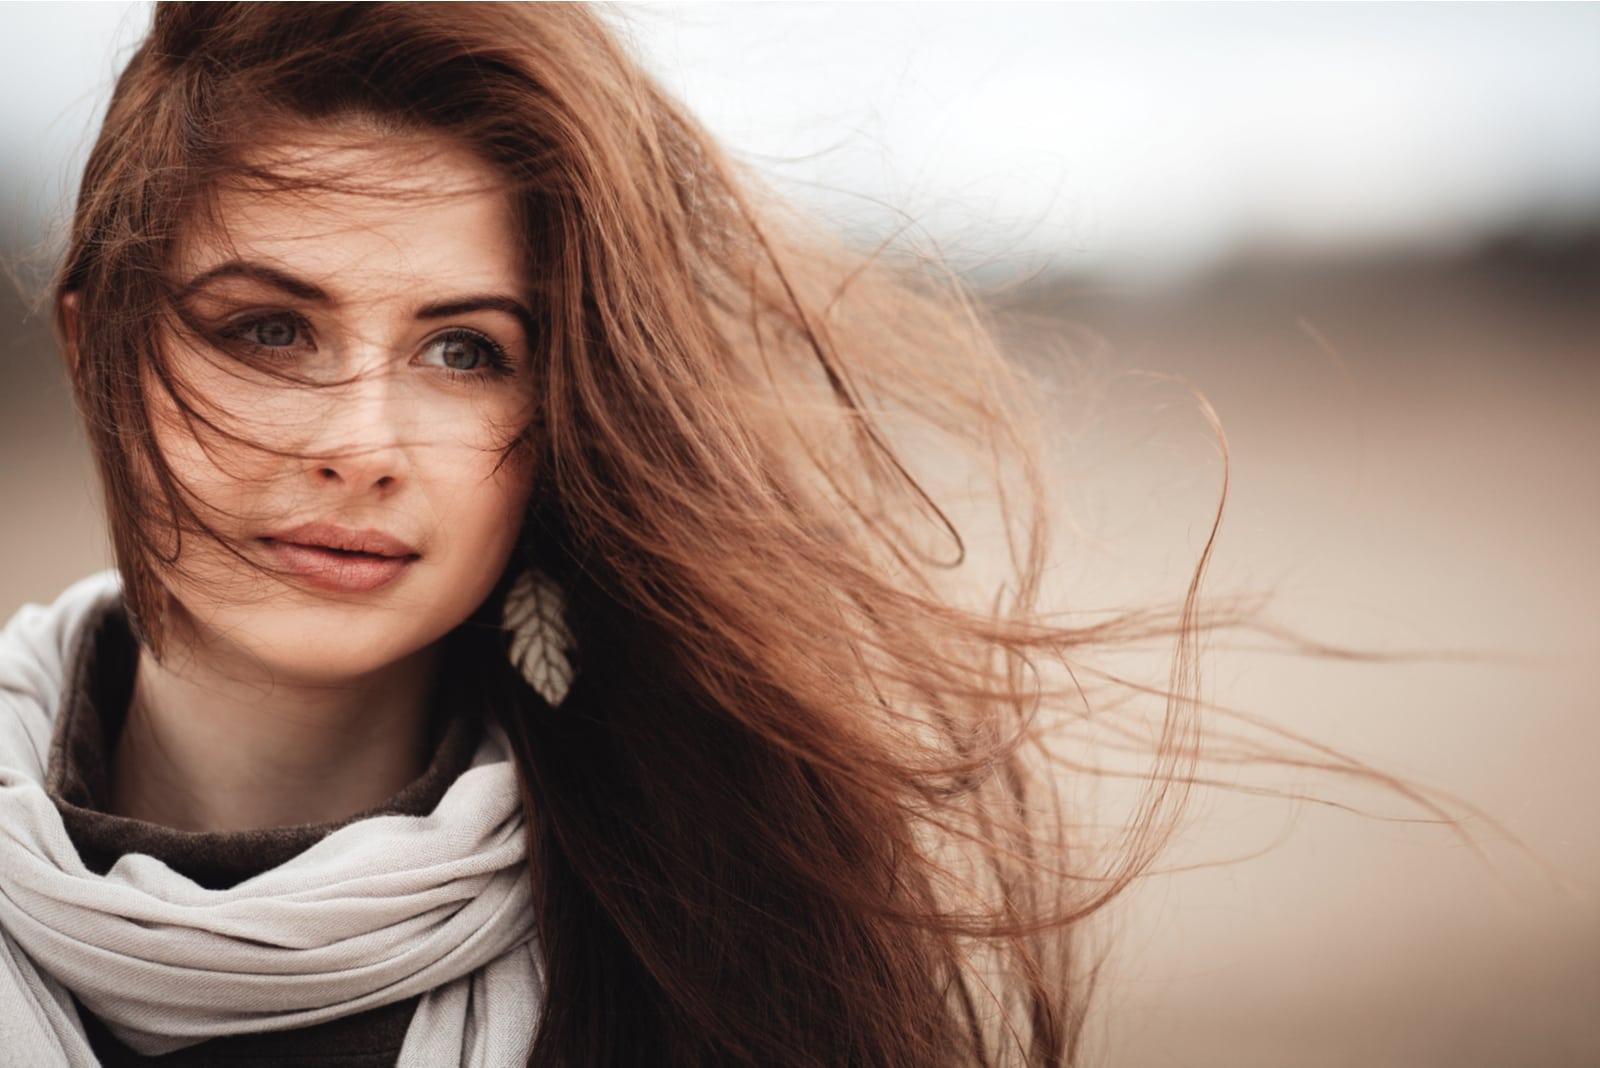 beautiful girl in nature windy hair